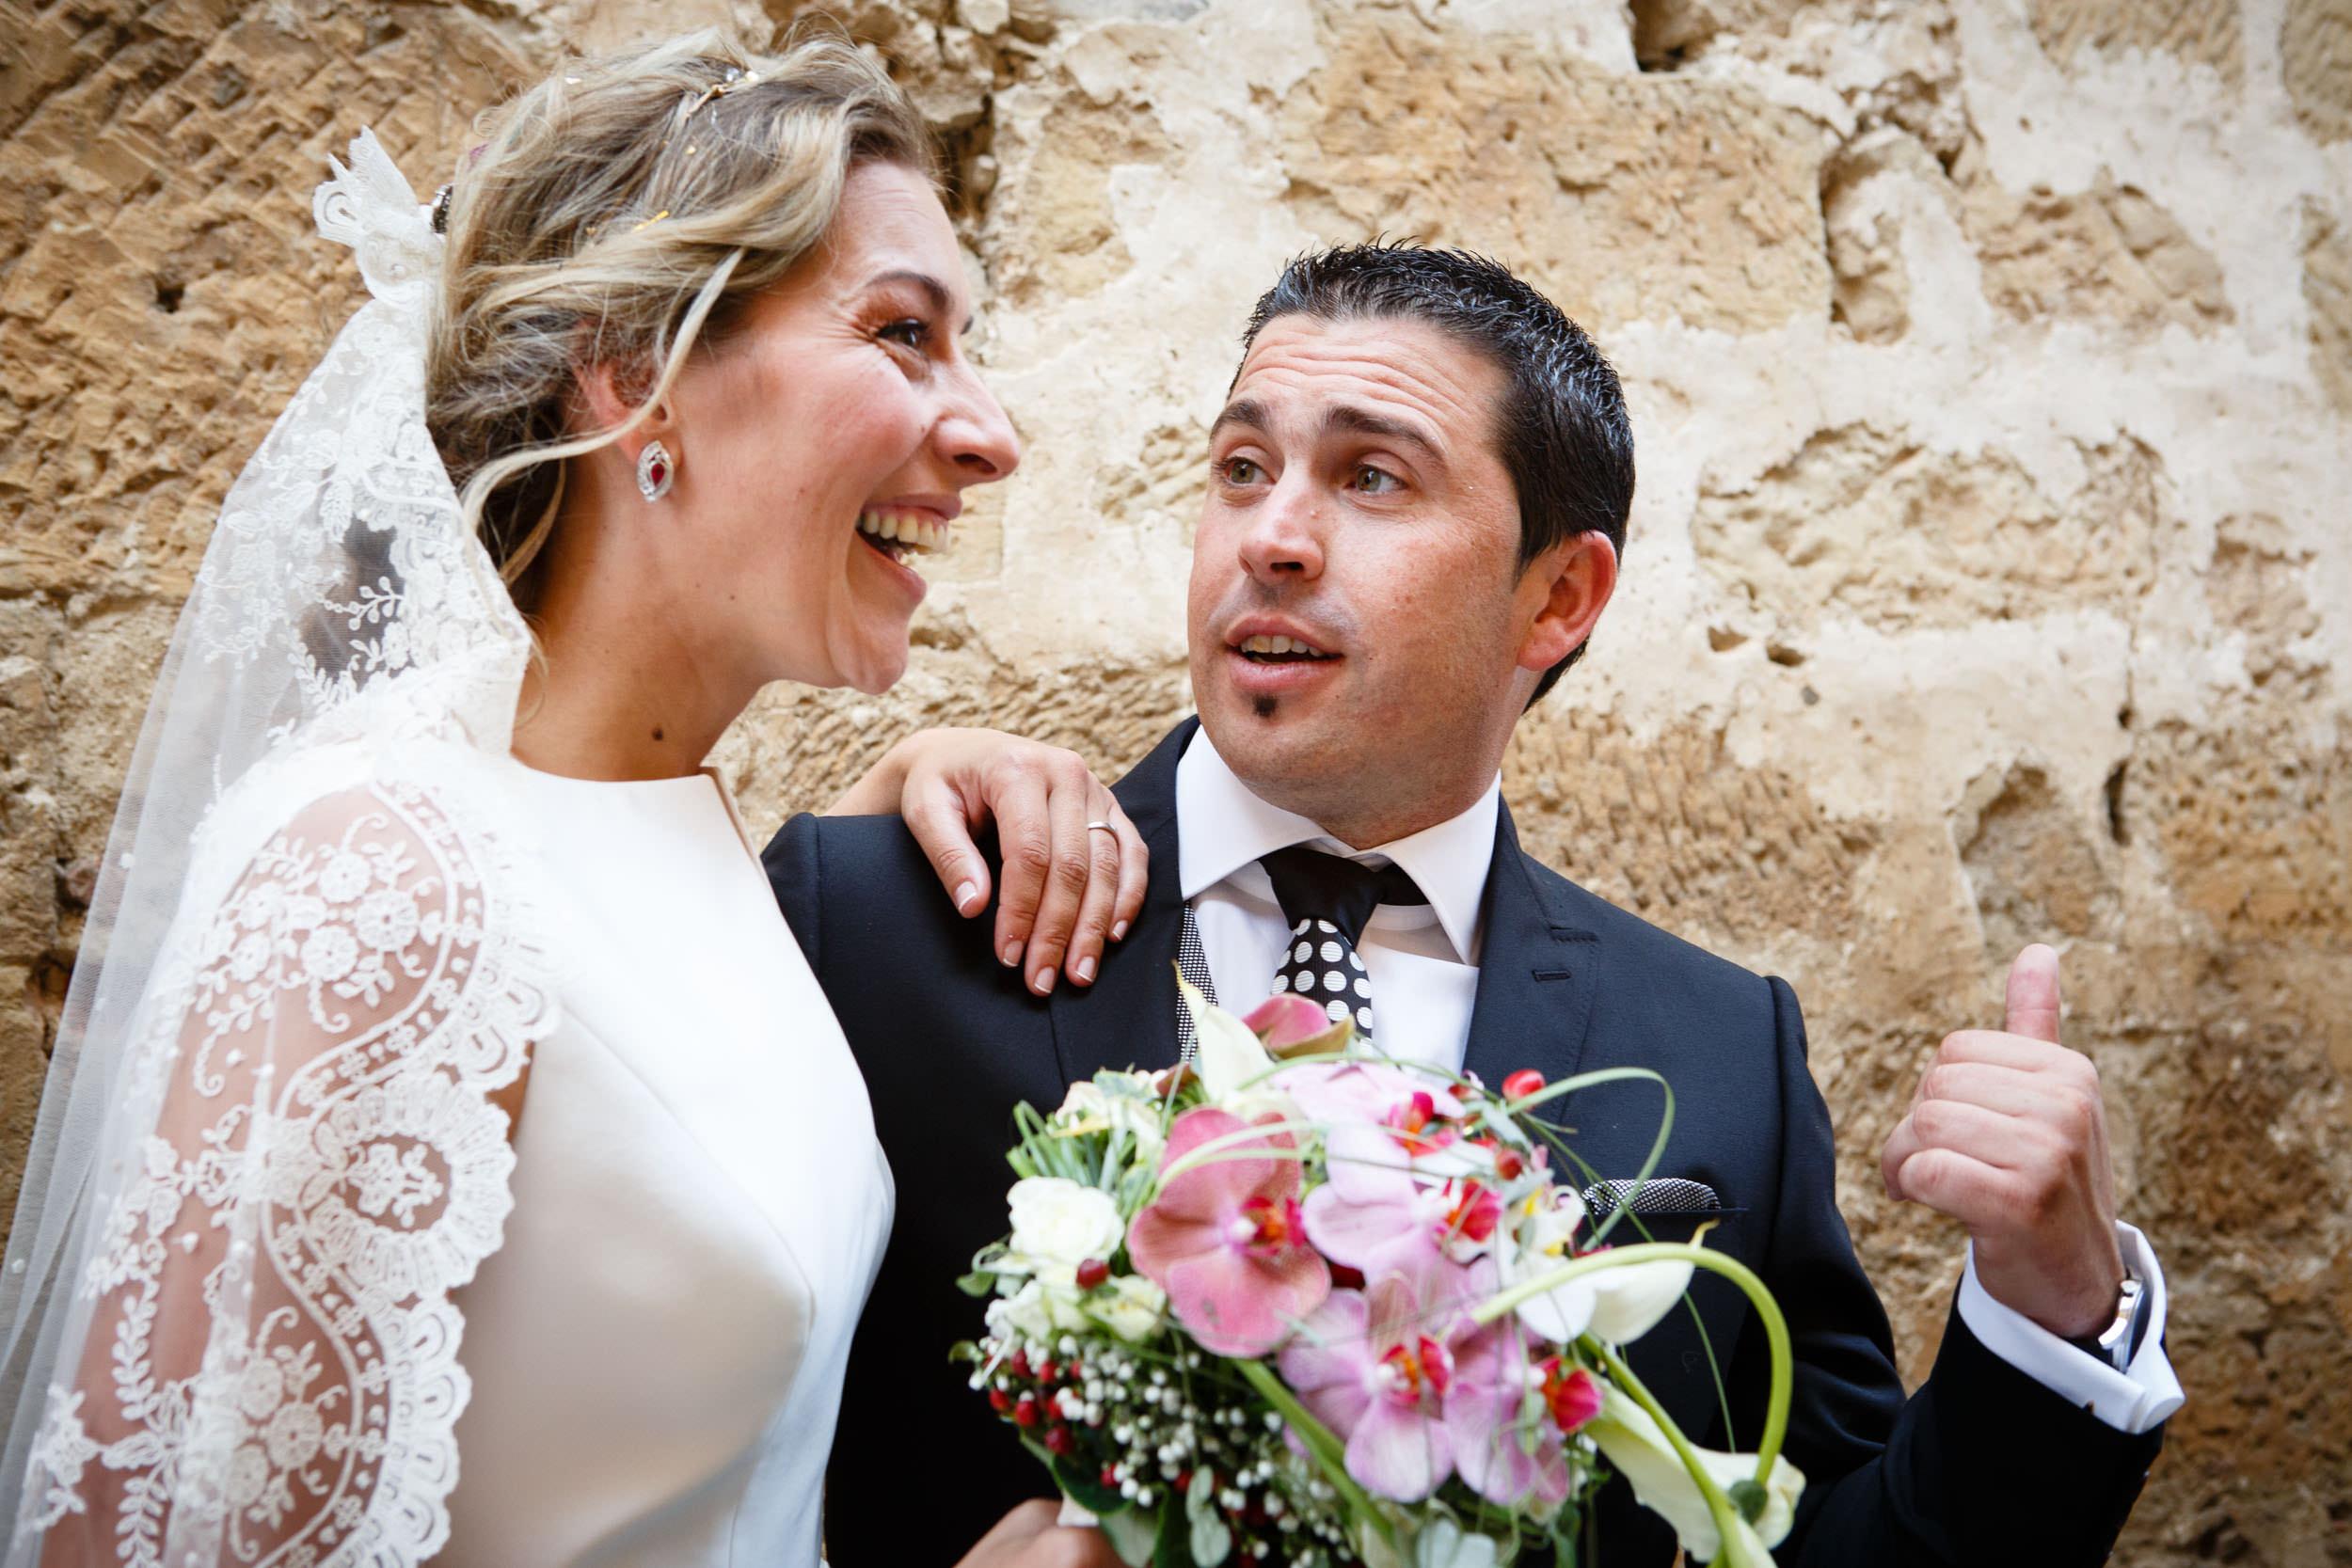 Wedding Photographer in Santo Domingo de la Calzada and Haro La Rioja Spain - James Sturcke  Photographer | sturcke.org_008.jpg